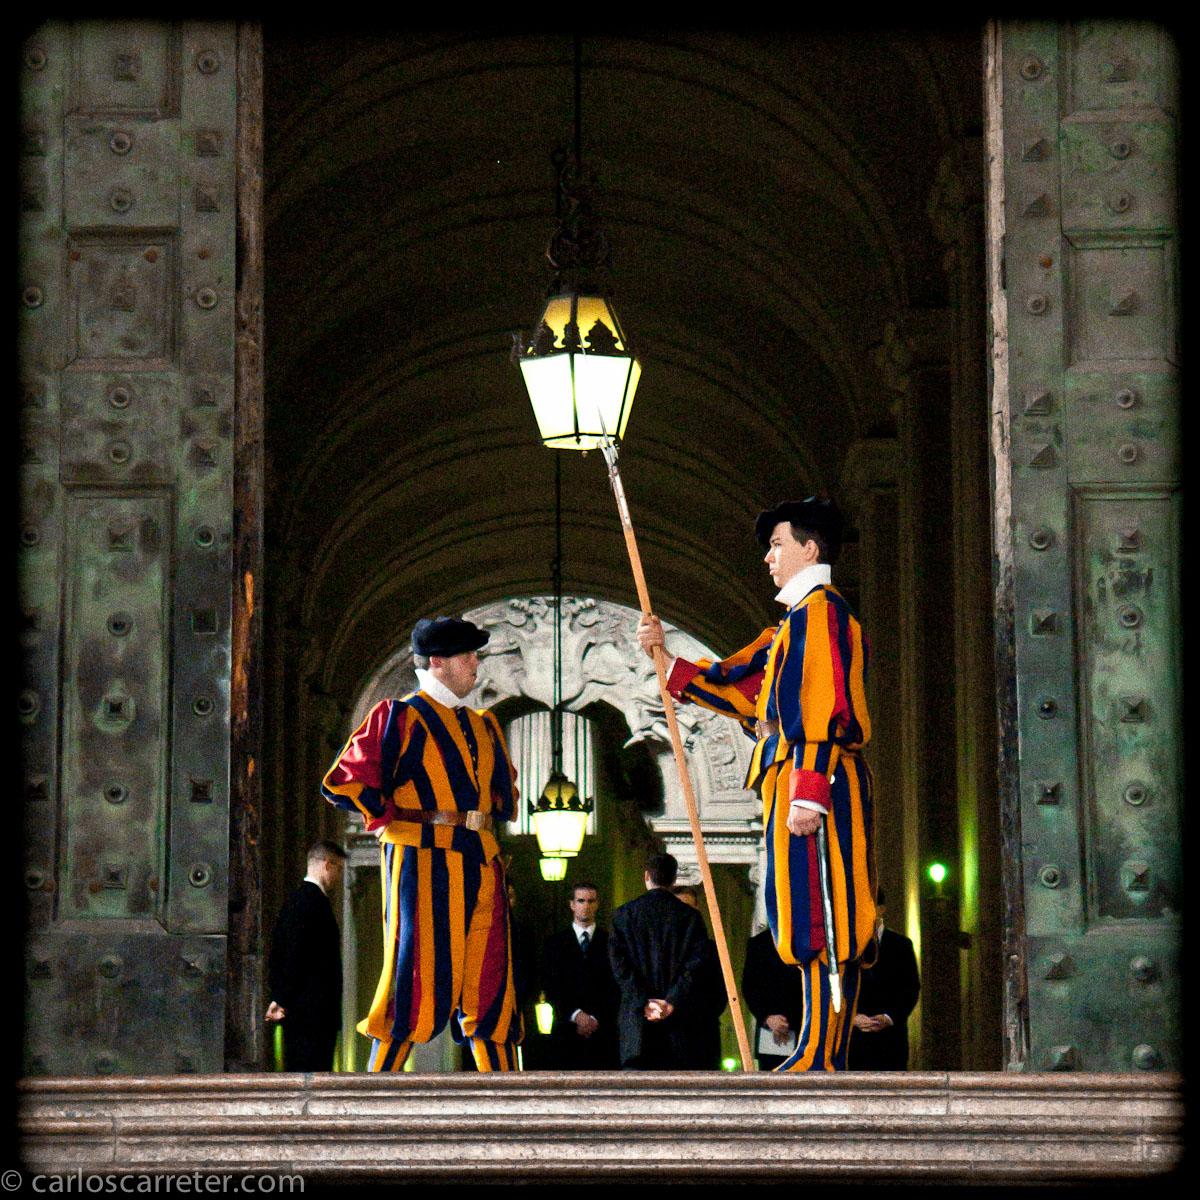 Guardia suiza - San Pietro in Vaticano